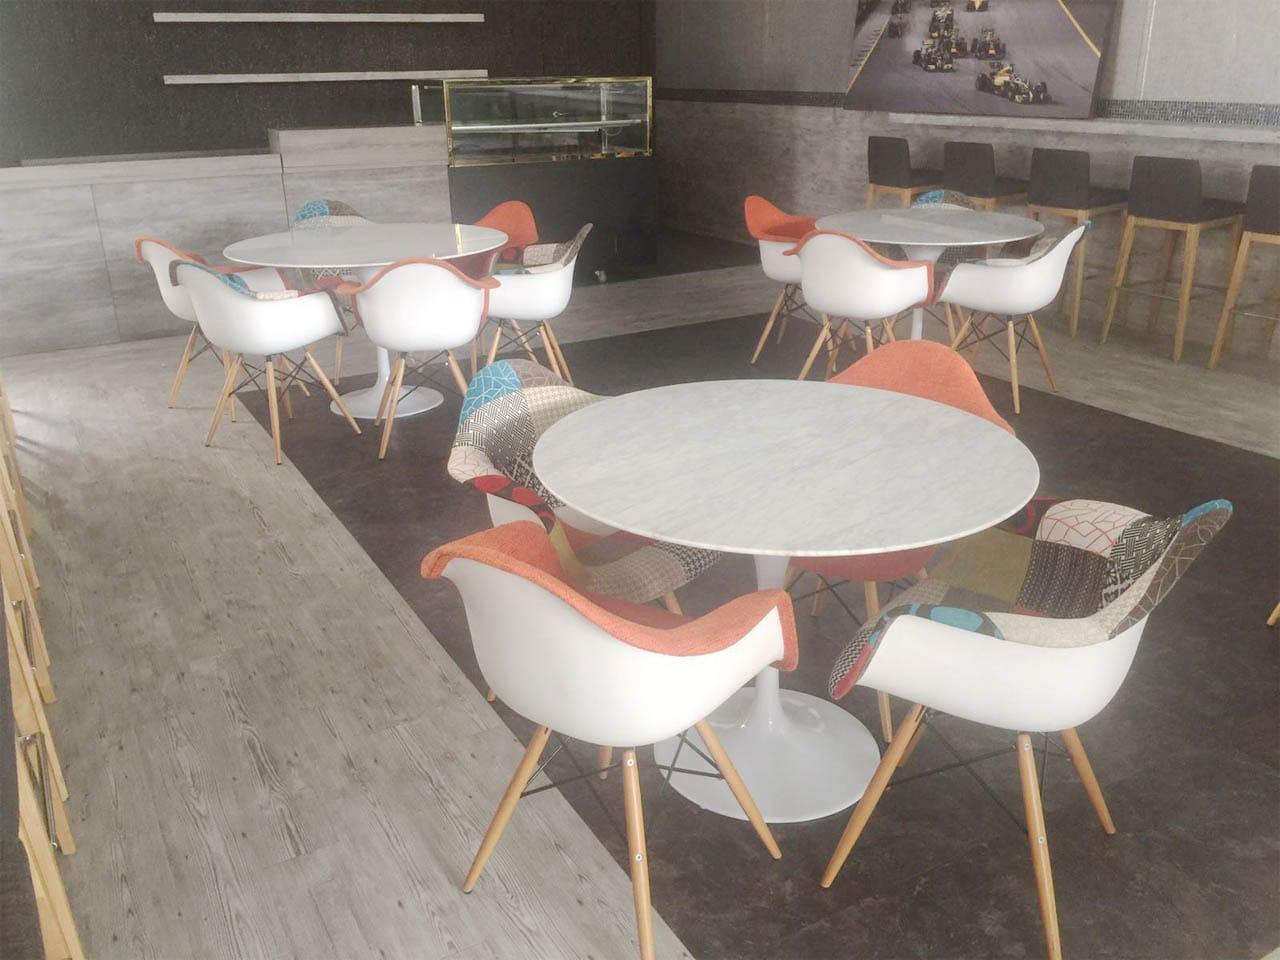 Tulip dining table round marble replica dia900 for Design table replica